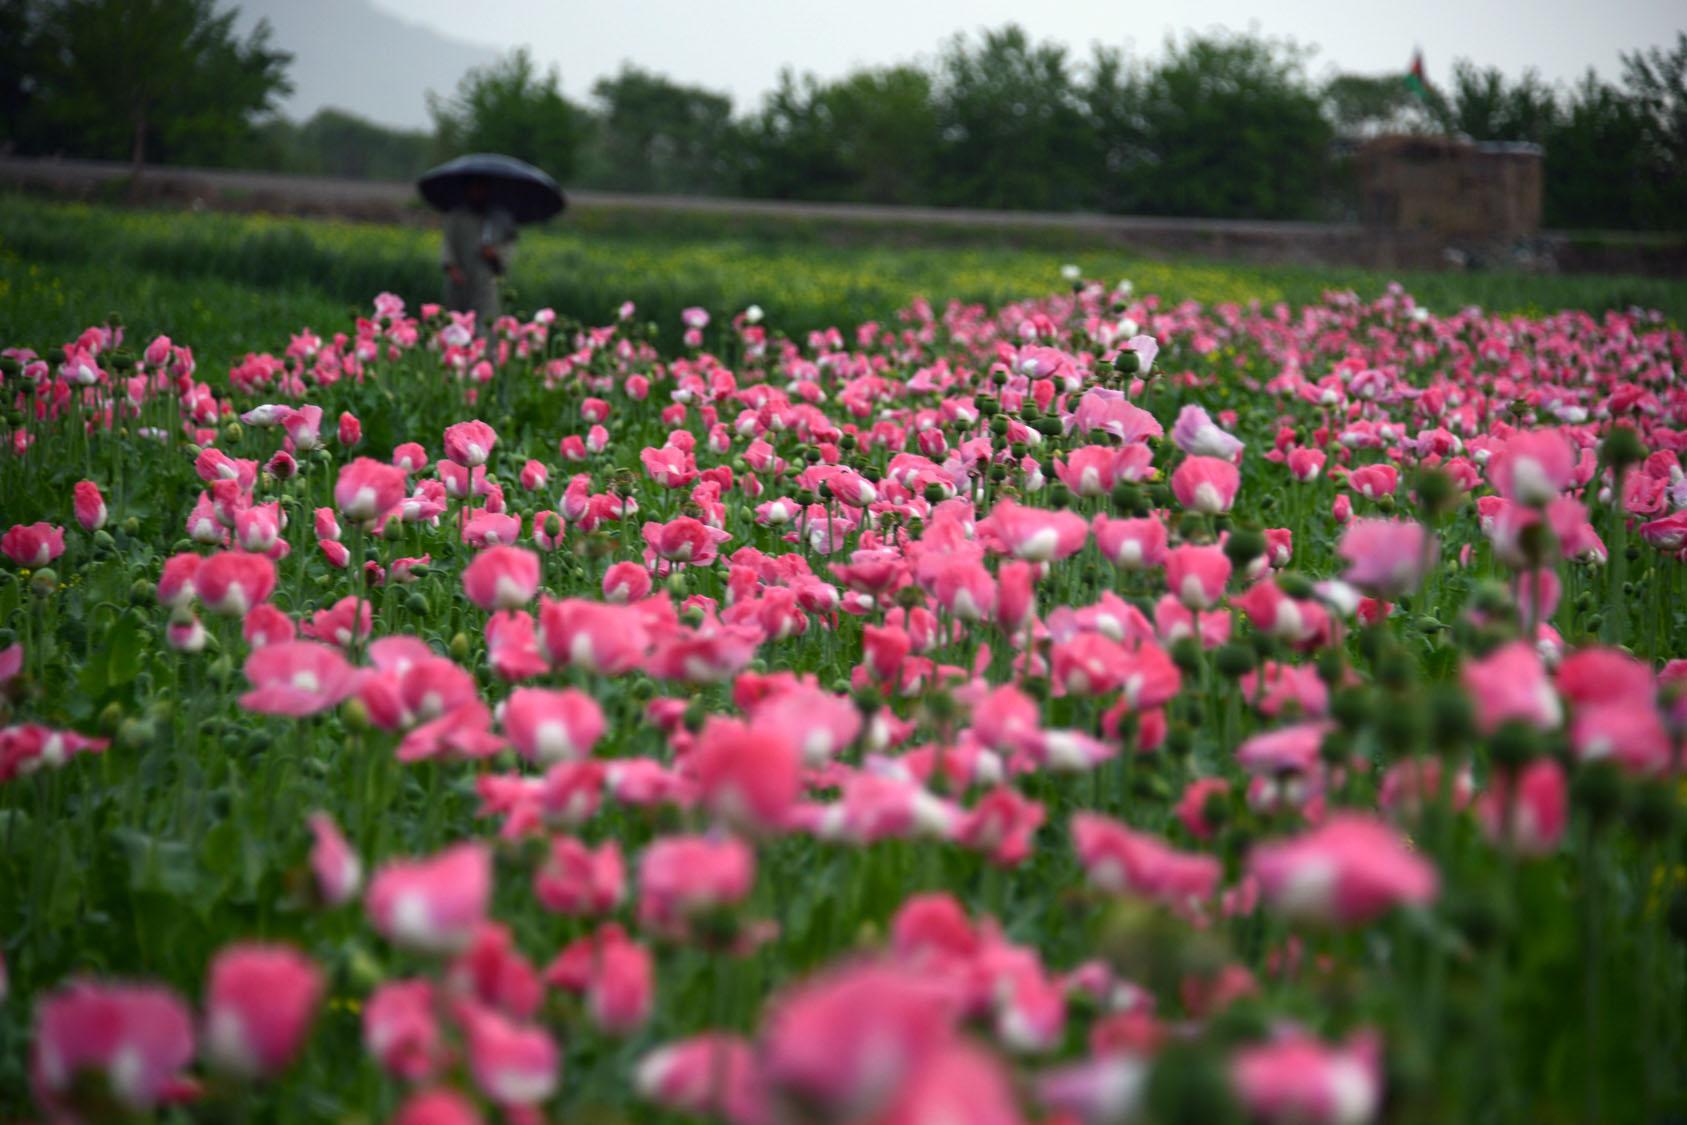 Harvesting Opium In Afghanistans Poppy Fields